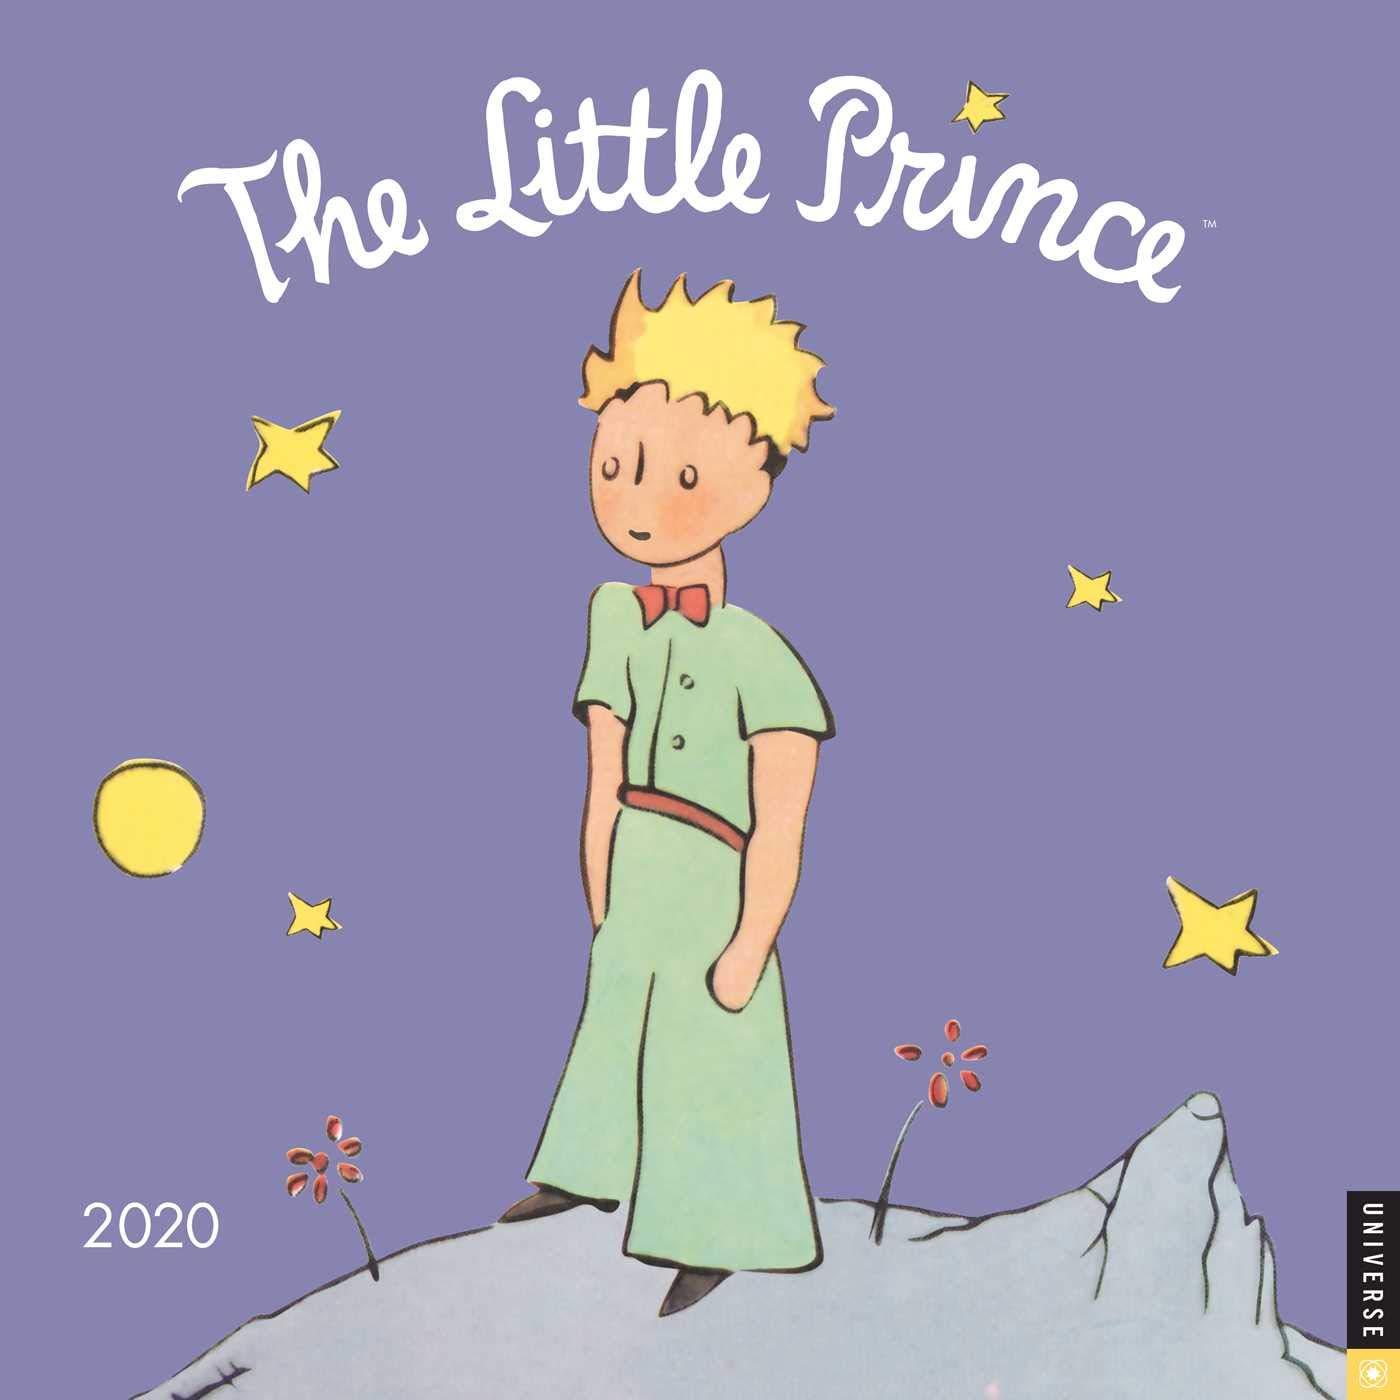 Prince Calendar 2020 The Little Prince 2020 Wall Calendar: Antoine de Saint Exupery